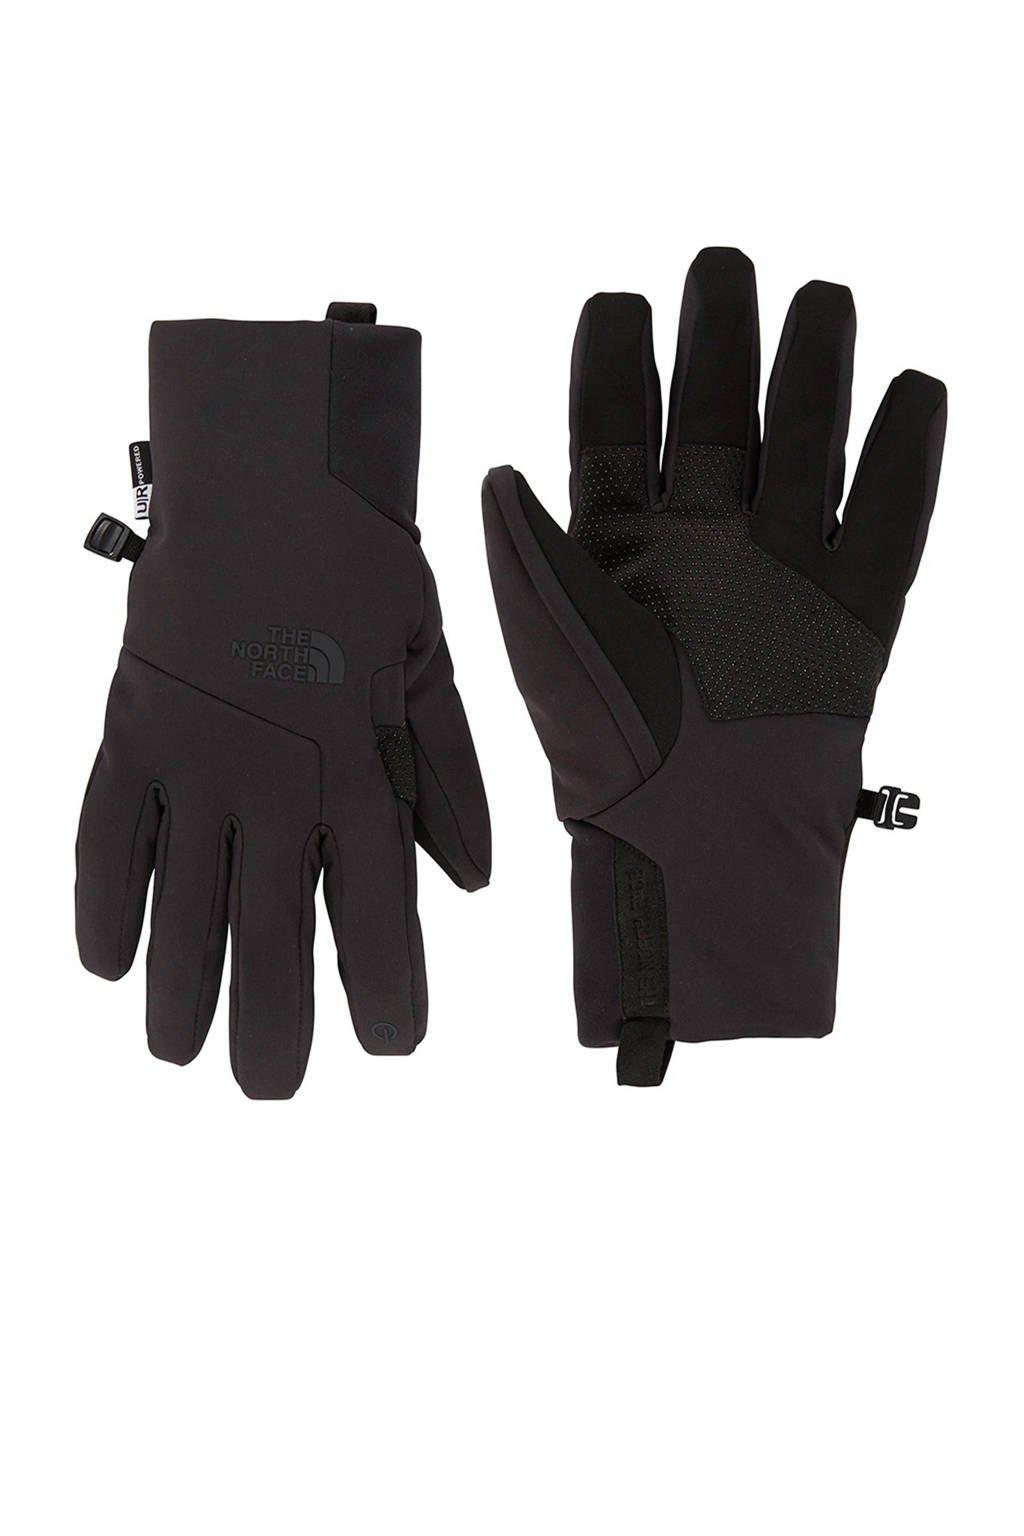 The North Face Etip GLove Apex+ touchscreen handschoenen, TNF Black